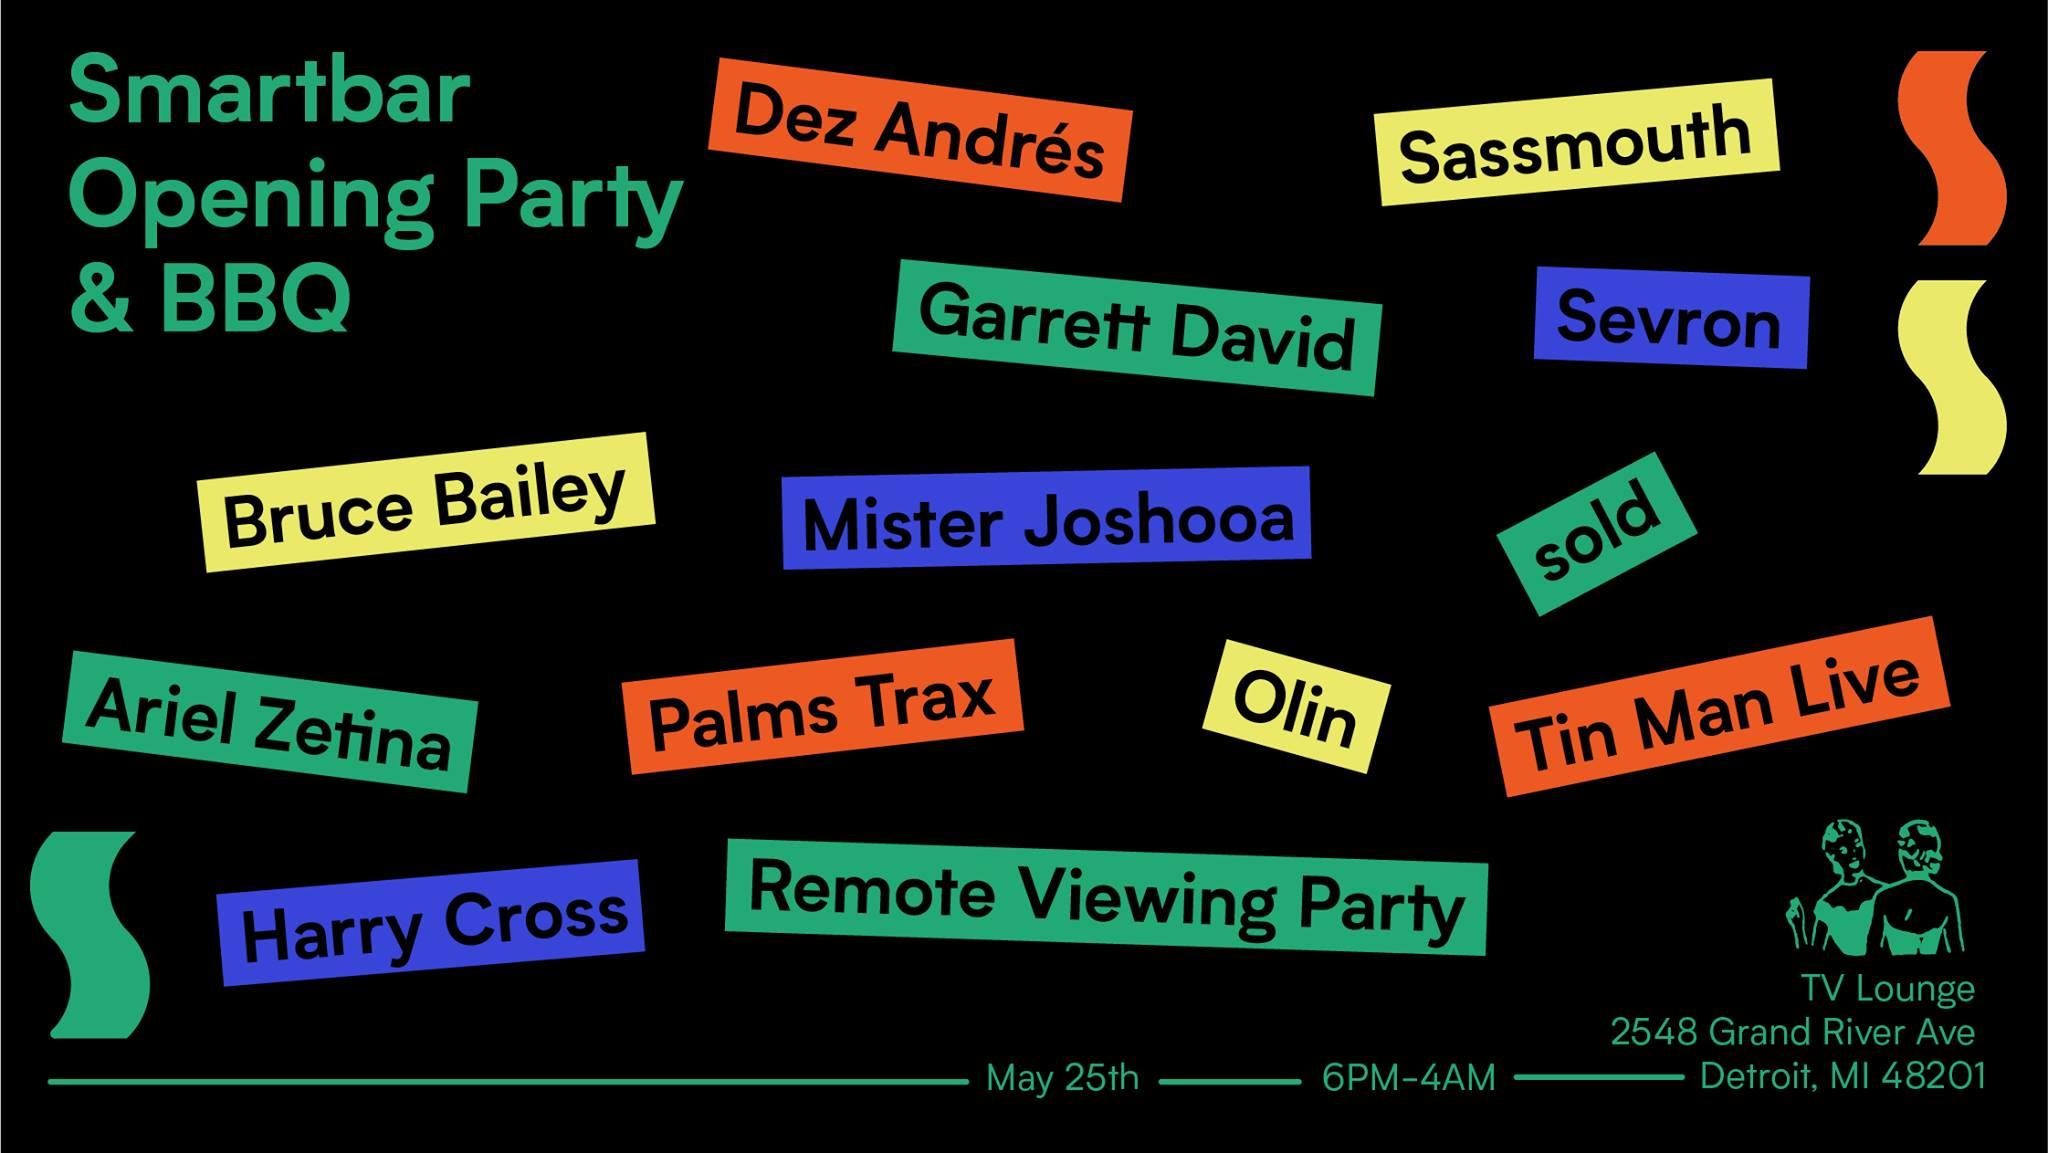 photo found via Facebook, TV Bar events